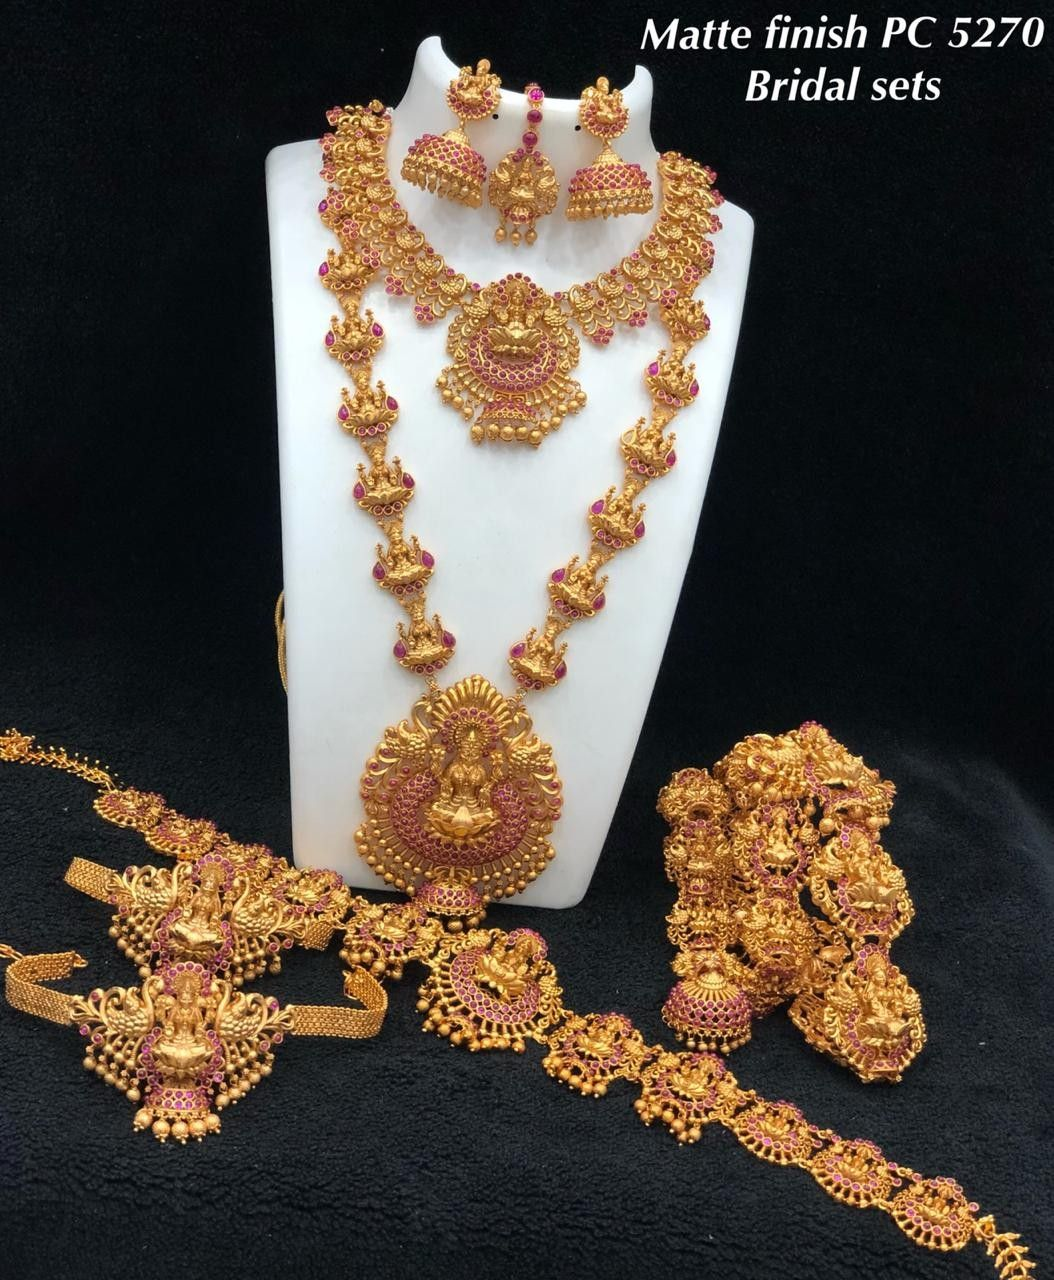 Pin Oleh Sarath Di Matte Finish Bridal Jewellery Weddings Jewellery Temple Jewellery Bridal Sets Indian Ad Bridal Sets